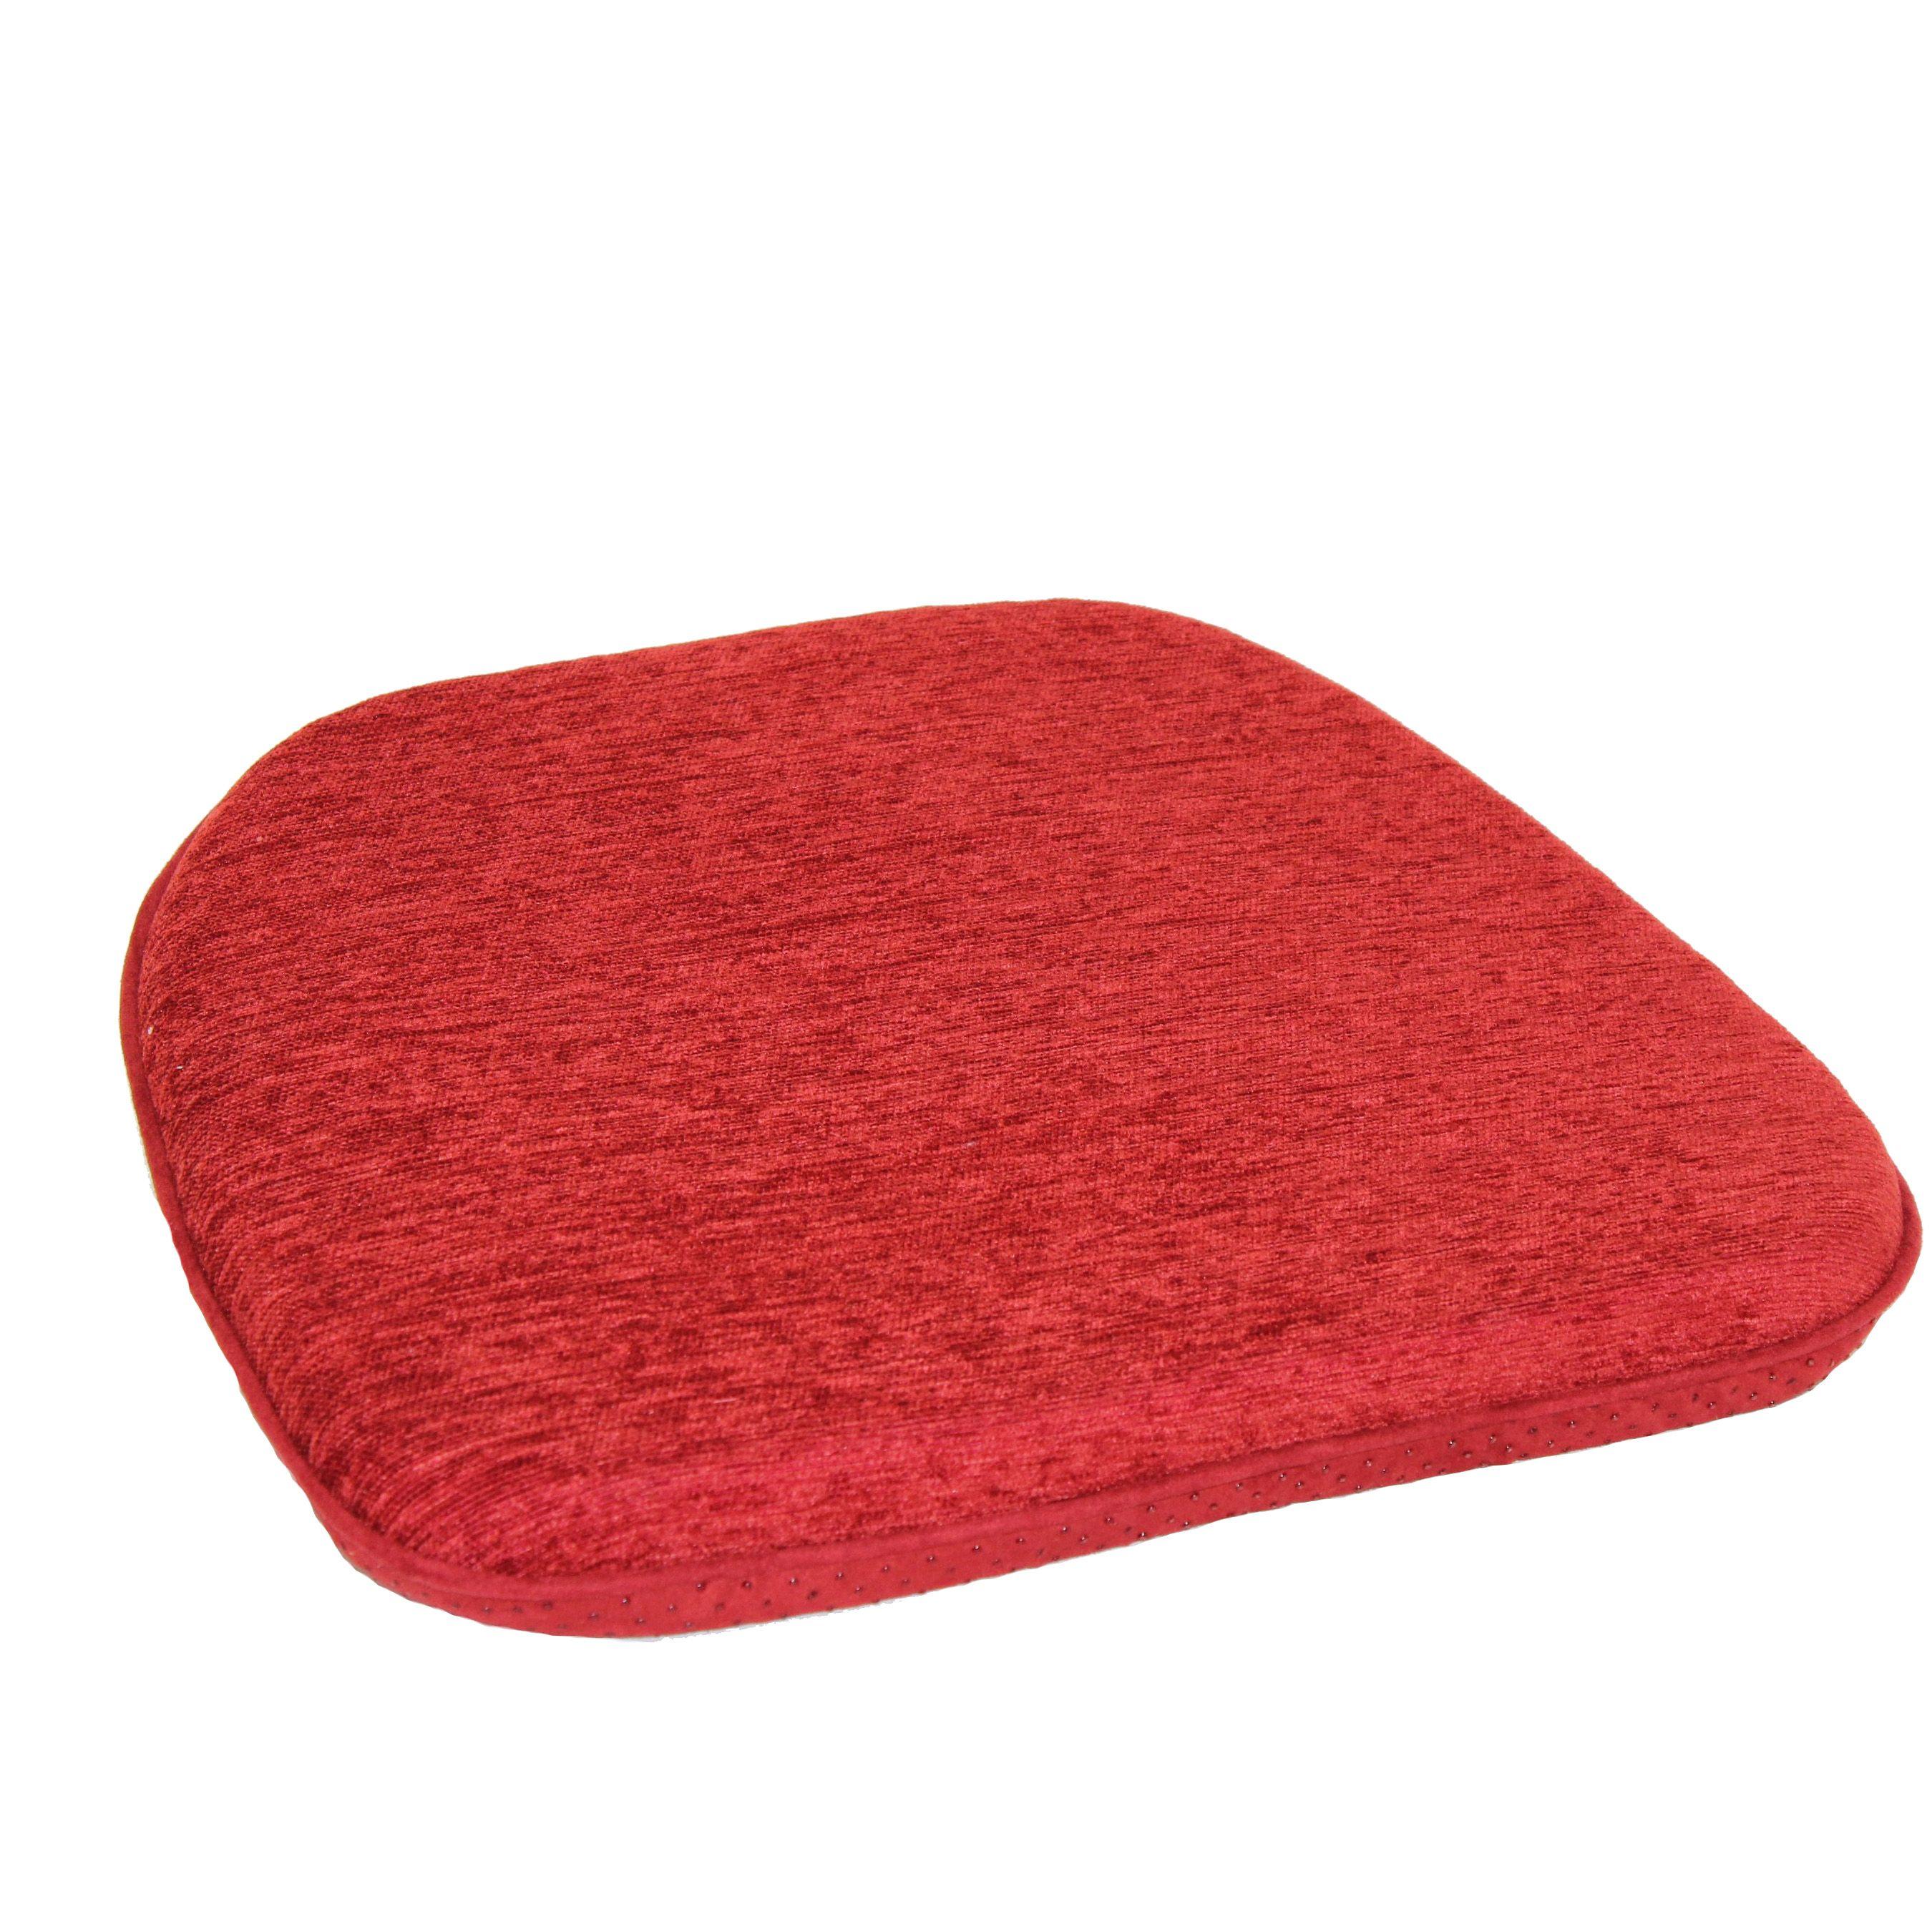 Gentil BRENTWOOD ORIGINALS INC Foam Chair Pad, Brown